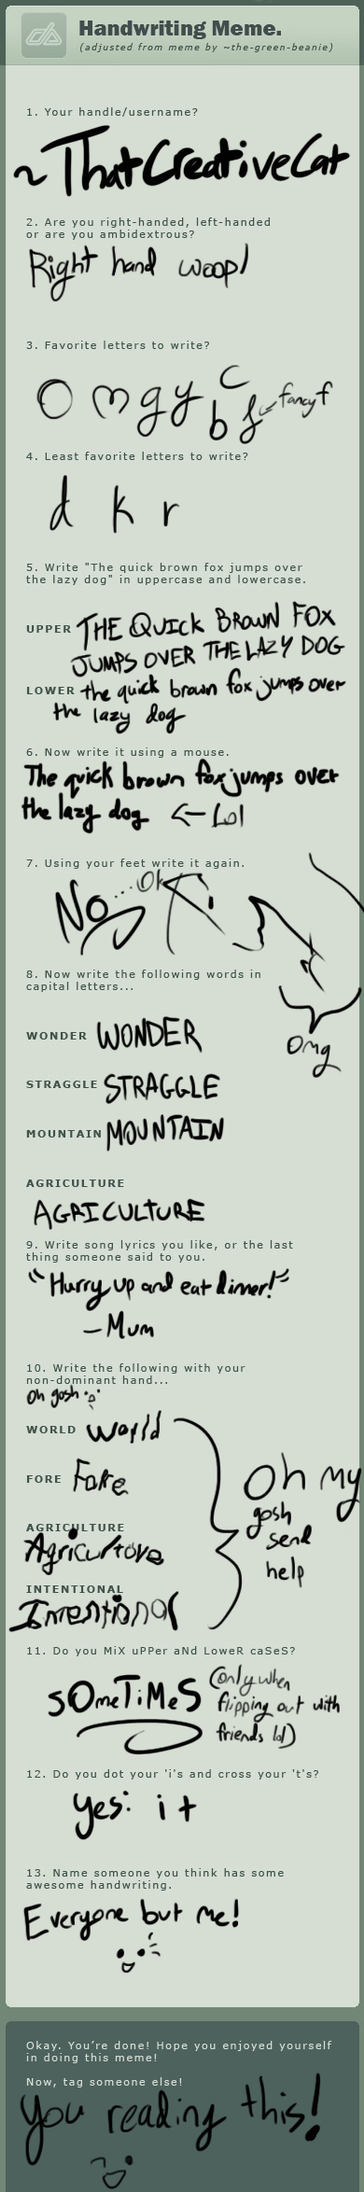 Handwriting Meme by ThatCreativeCat